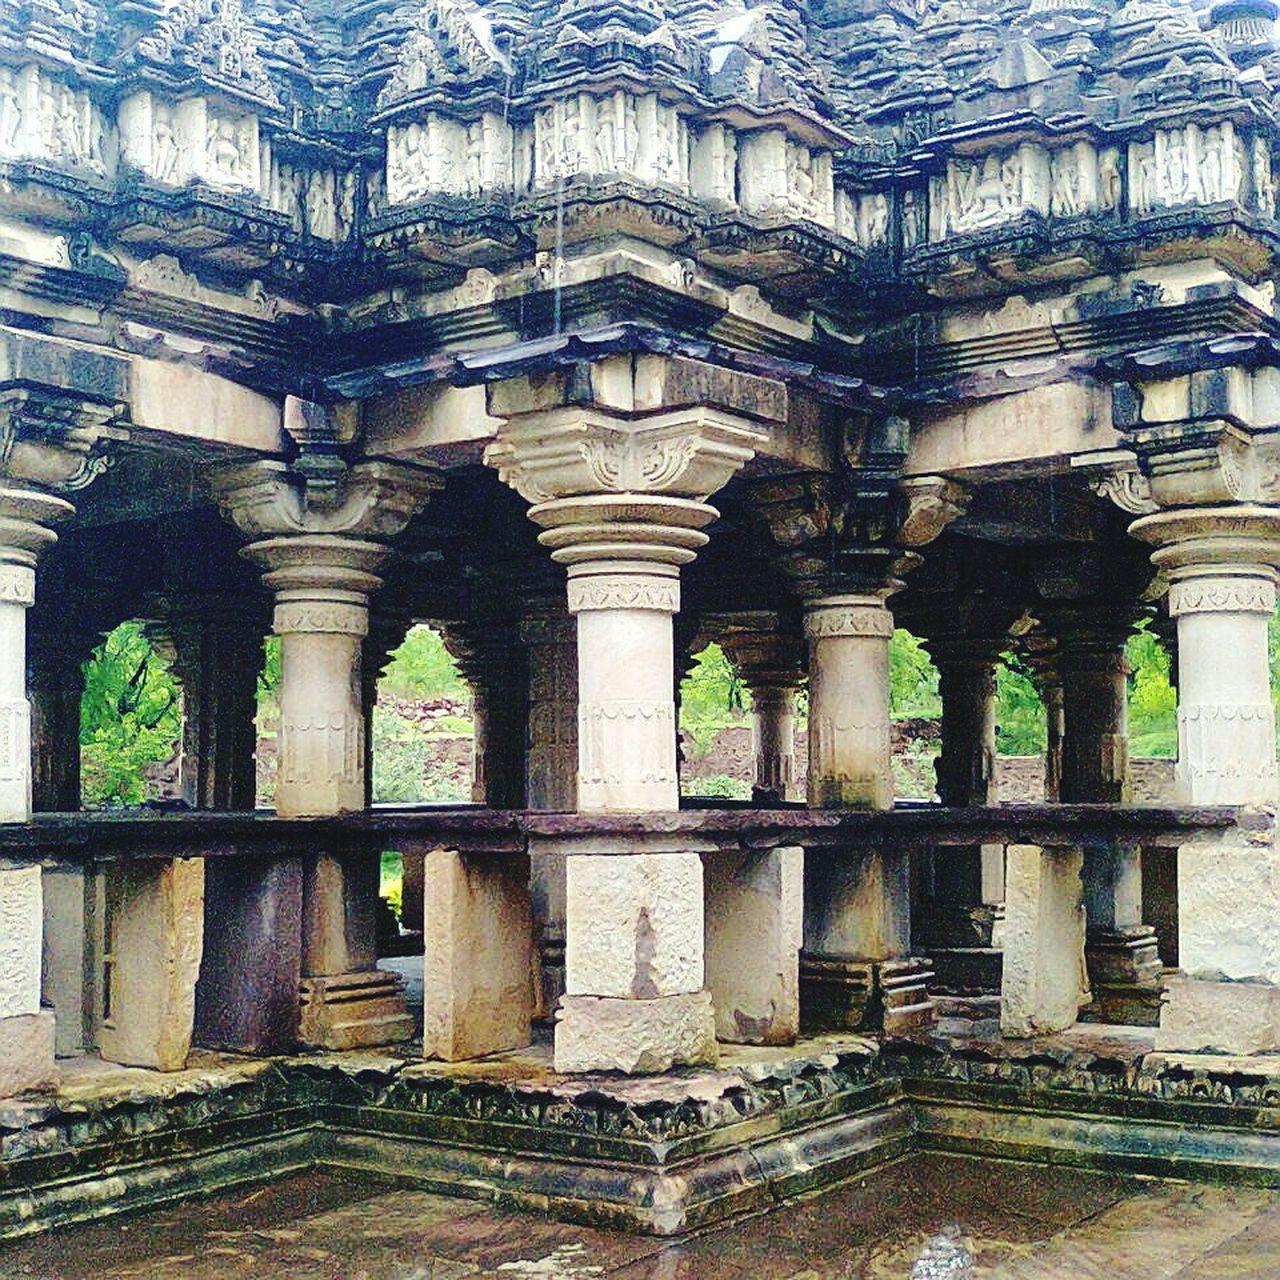 architectural column, architecture, history, day, built structure, no people, travel destinations, outdoors, ancient civilization